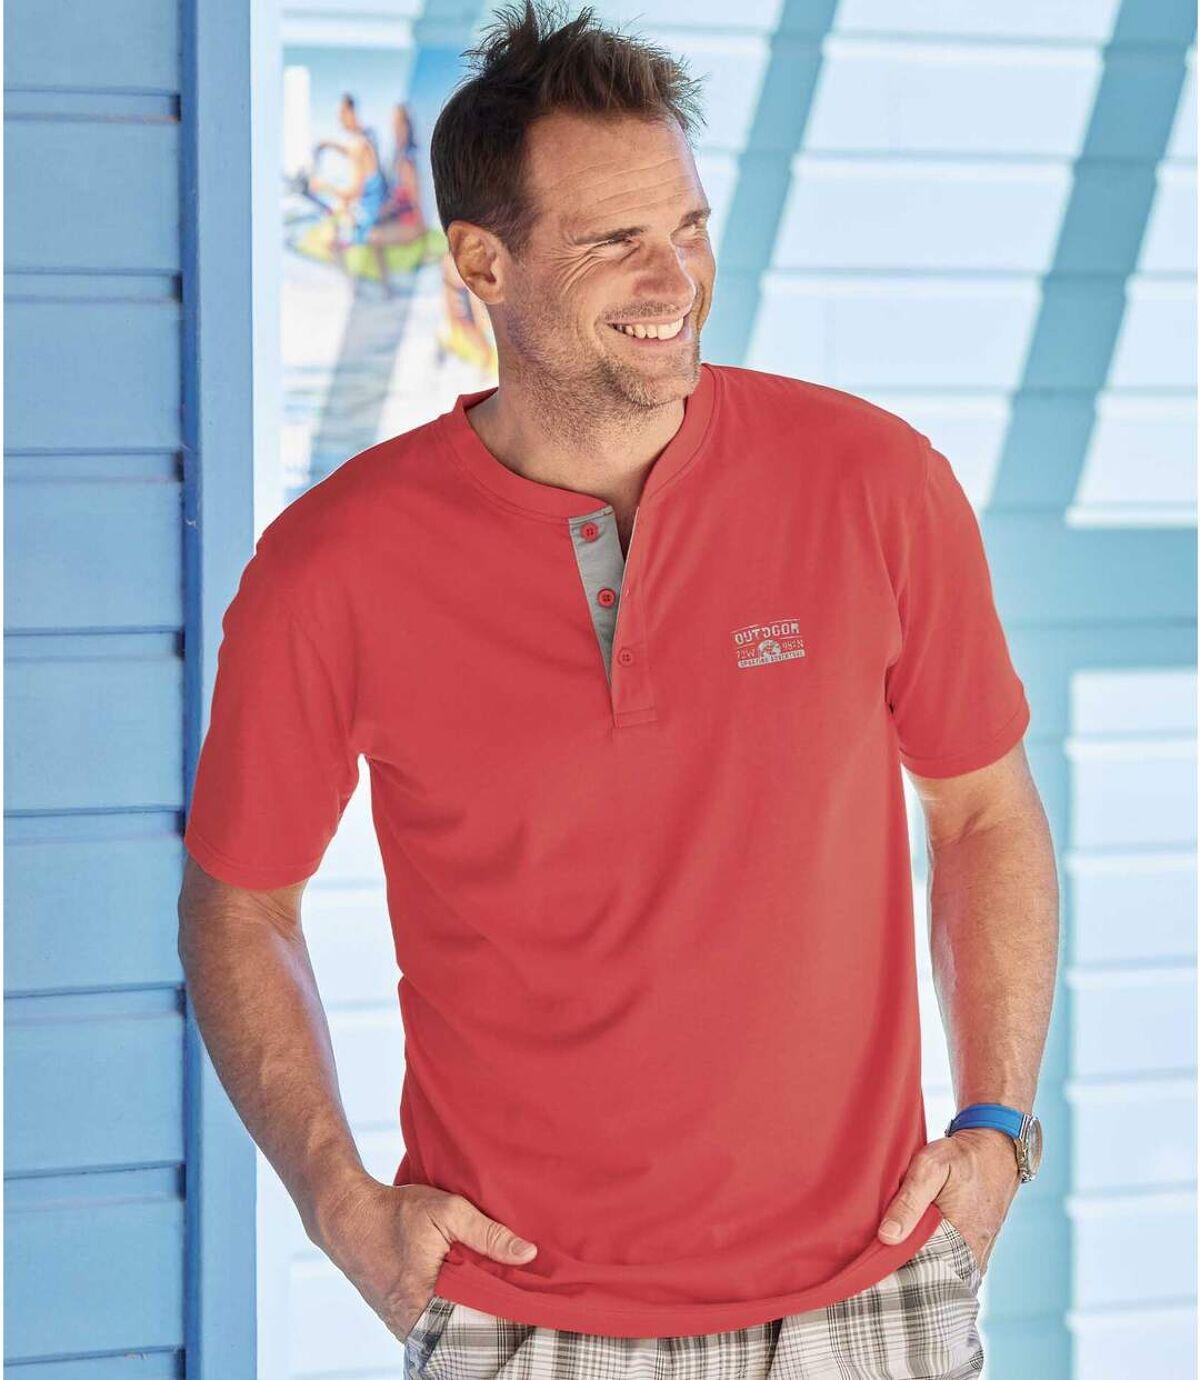 Zestaw 3 t-shirtów z dekoltem z guzikami Outdoor Atlas For Men